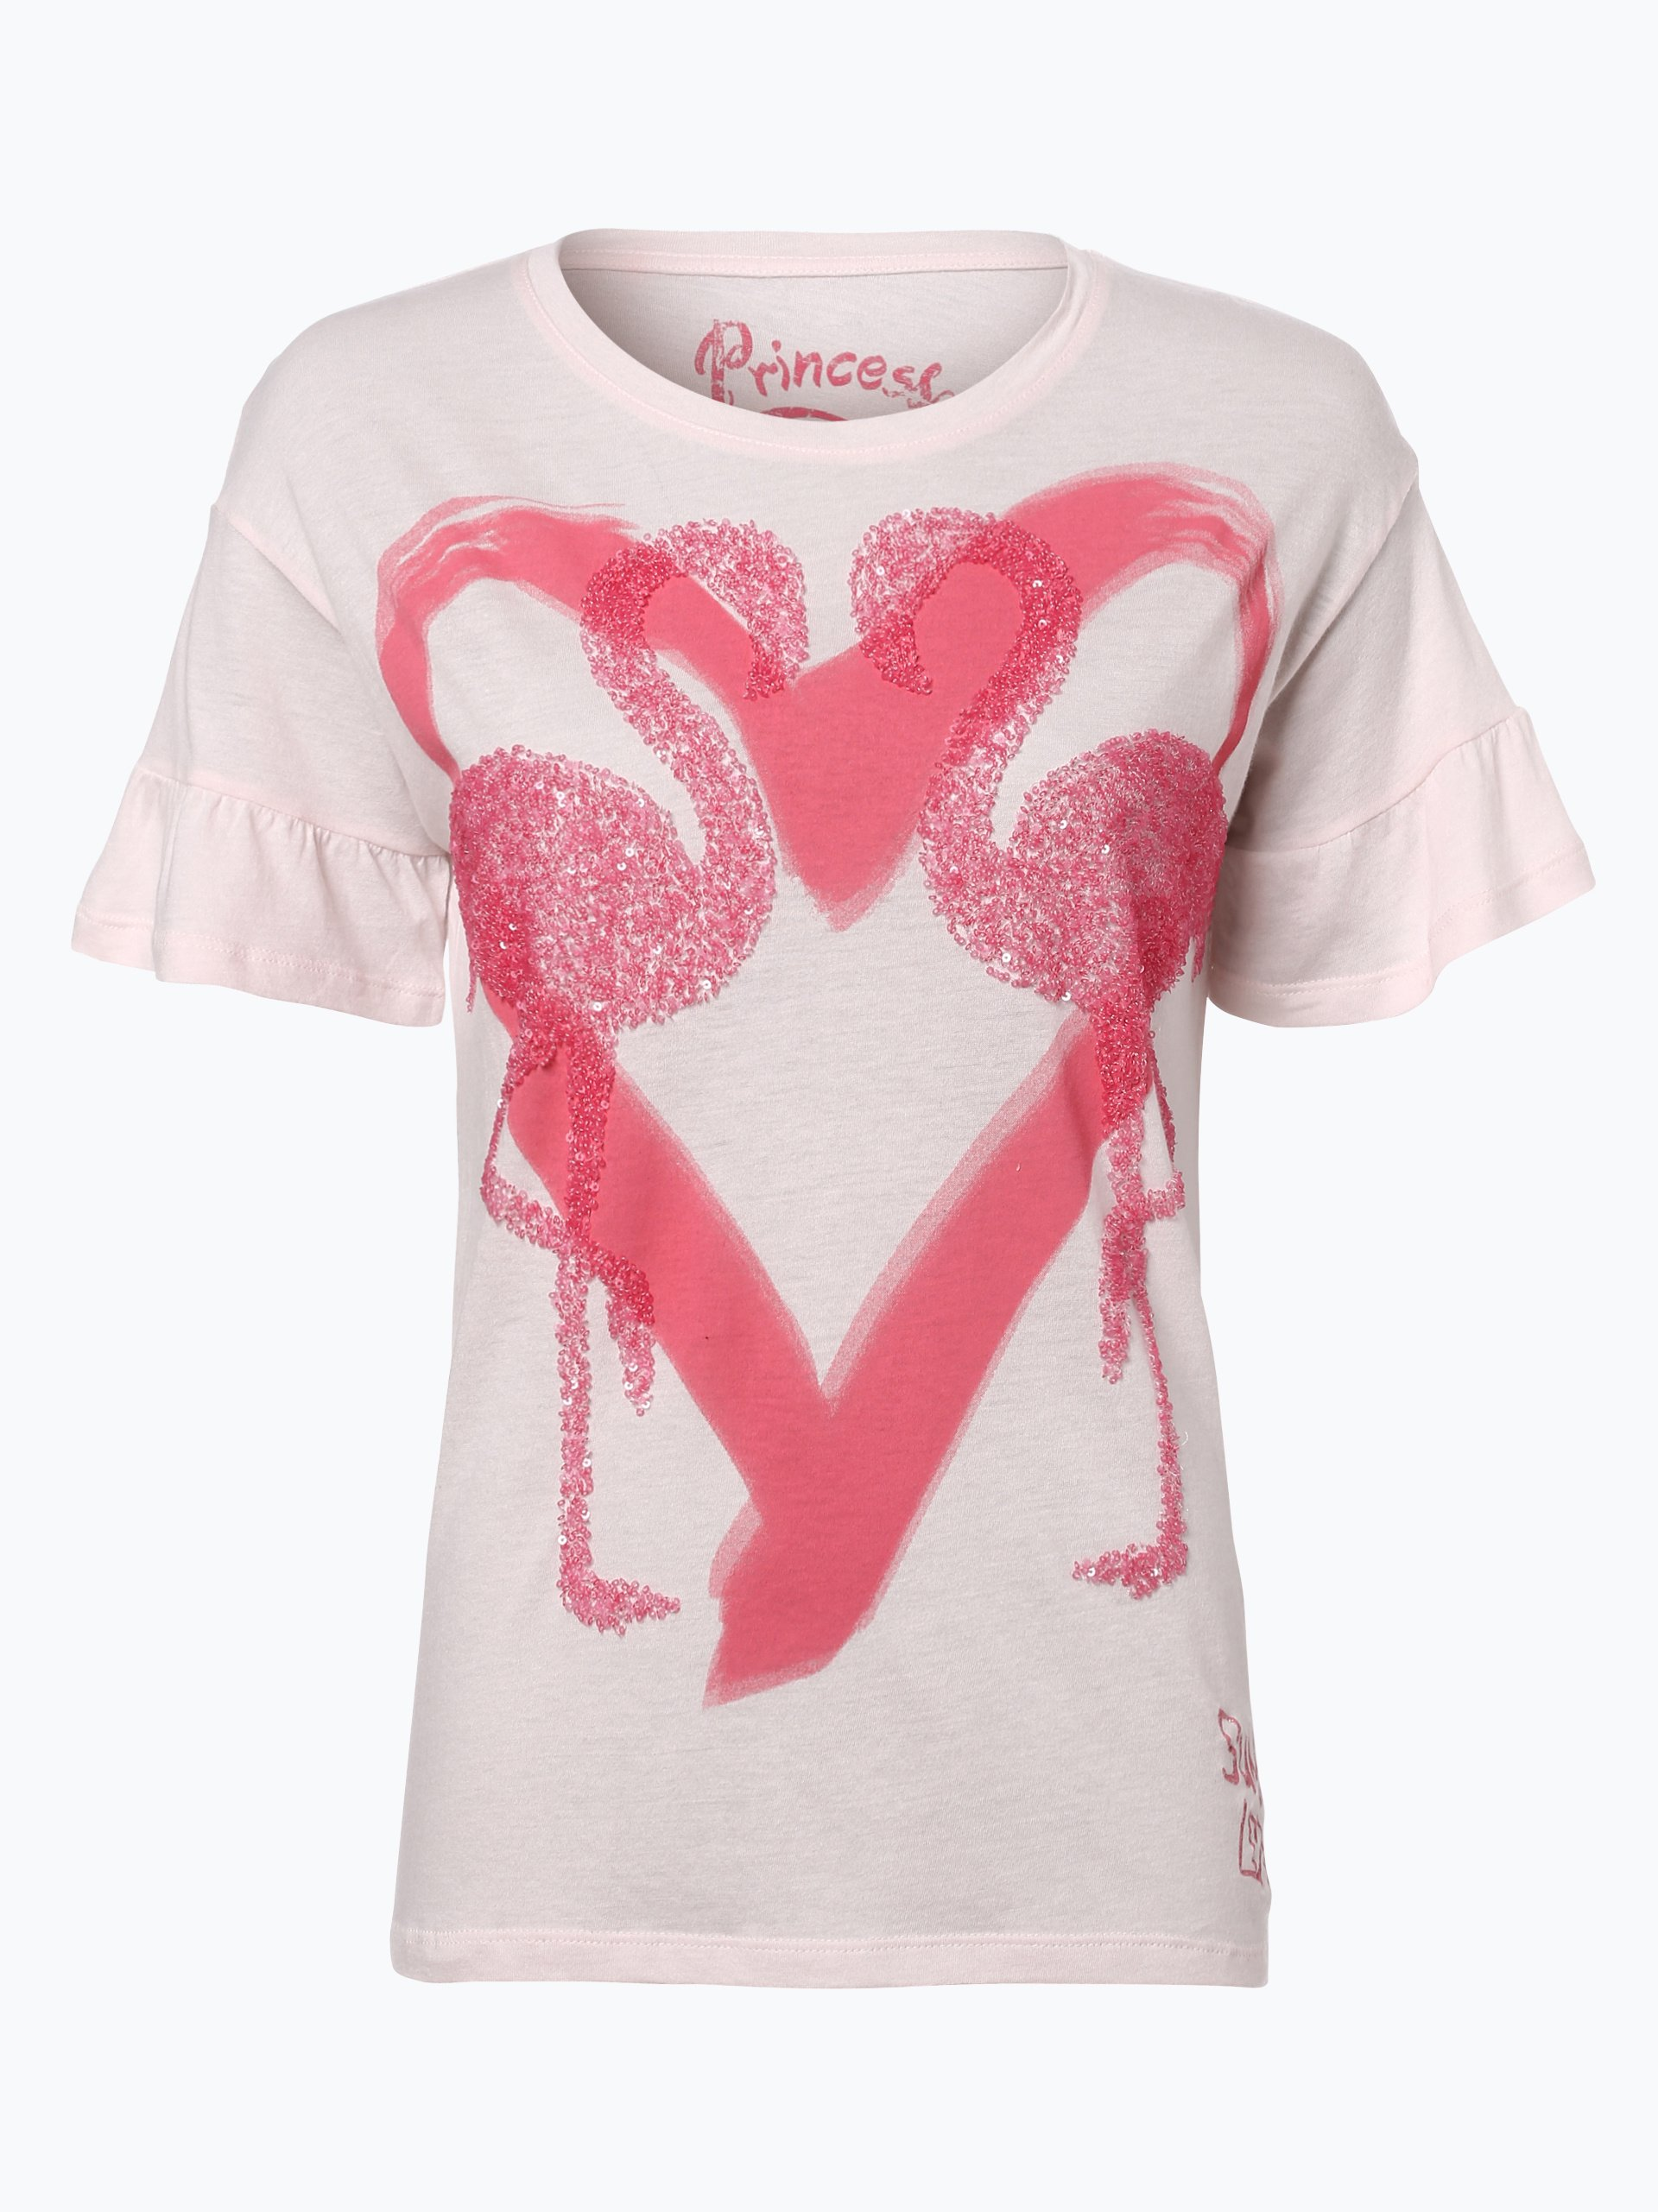 princess goes hollywood damen t shirt rosa gemustert. Black Bedroom Furniture Sets. Home Design Ideas